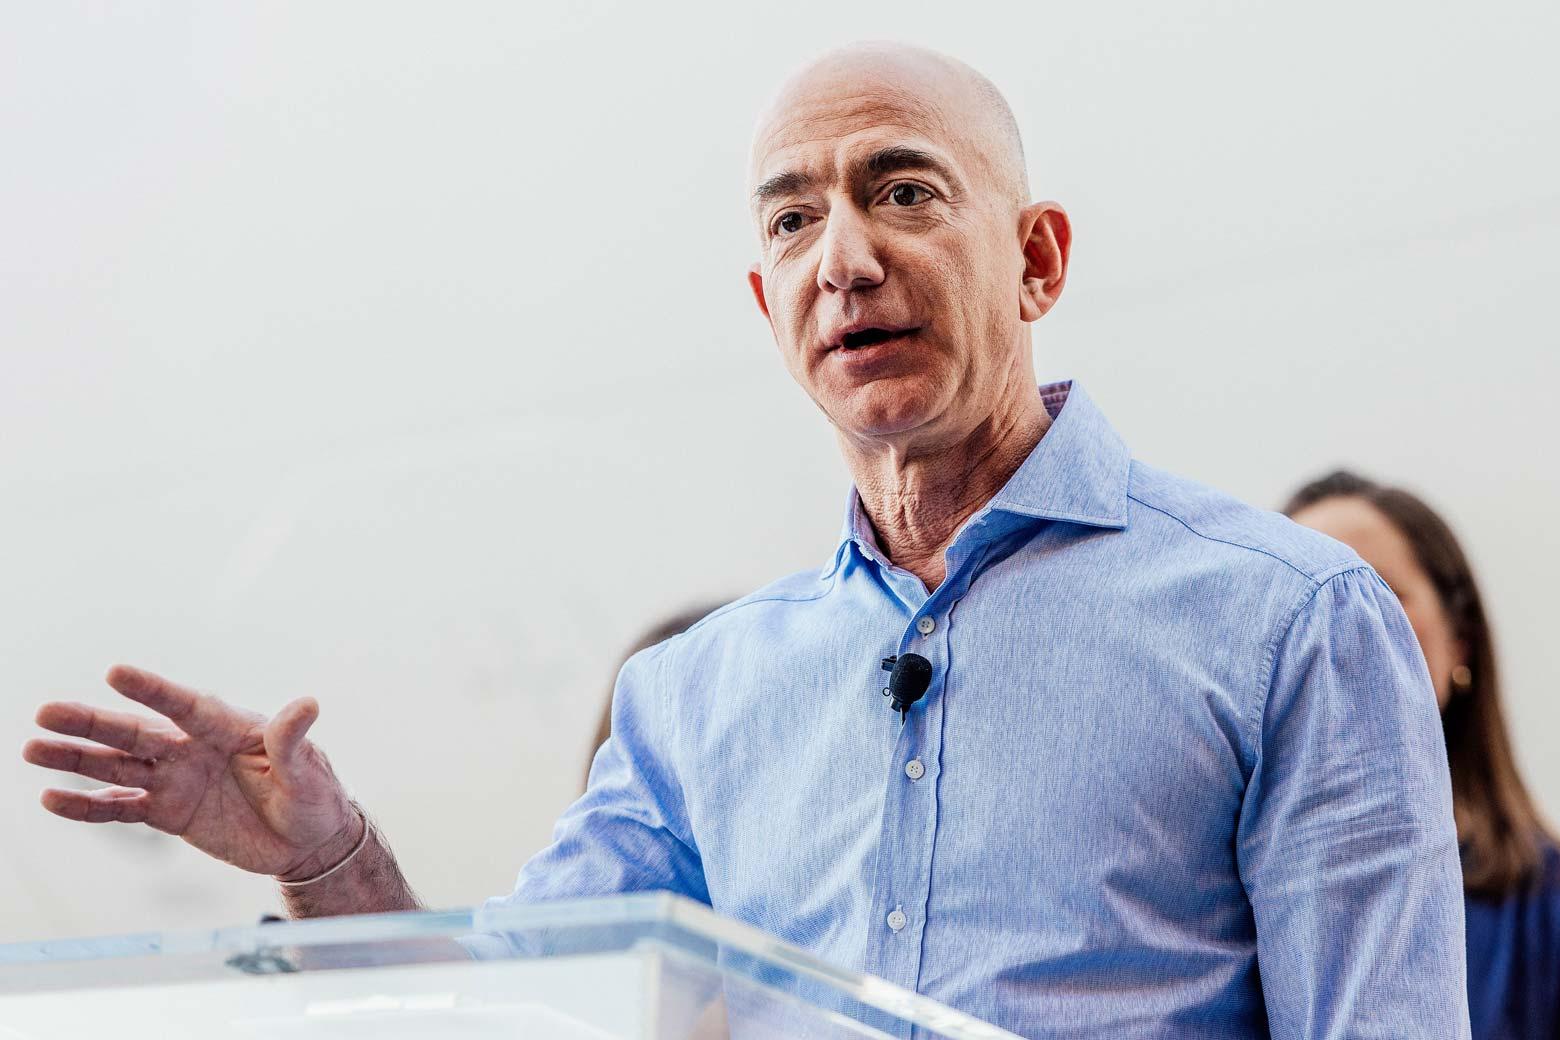 Jeff Bezos speaks to a group of Amazon employees.